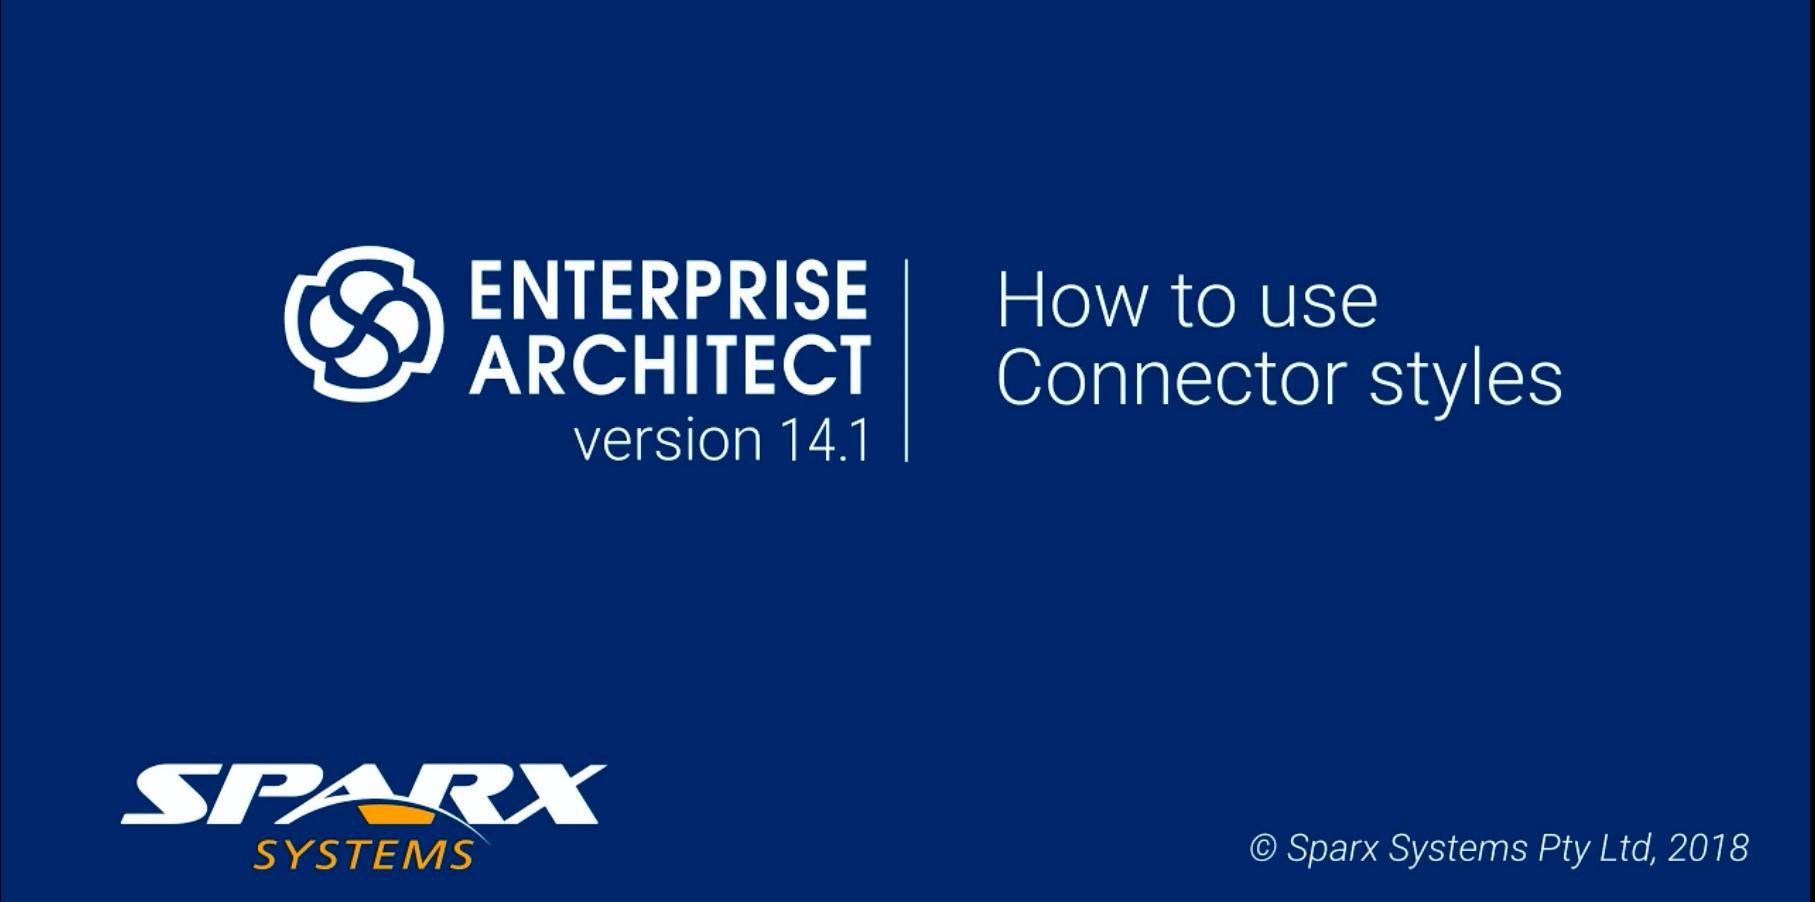 Enterprise Architect视频教程:如何使用连接器样式